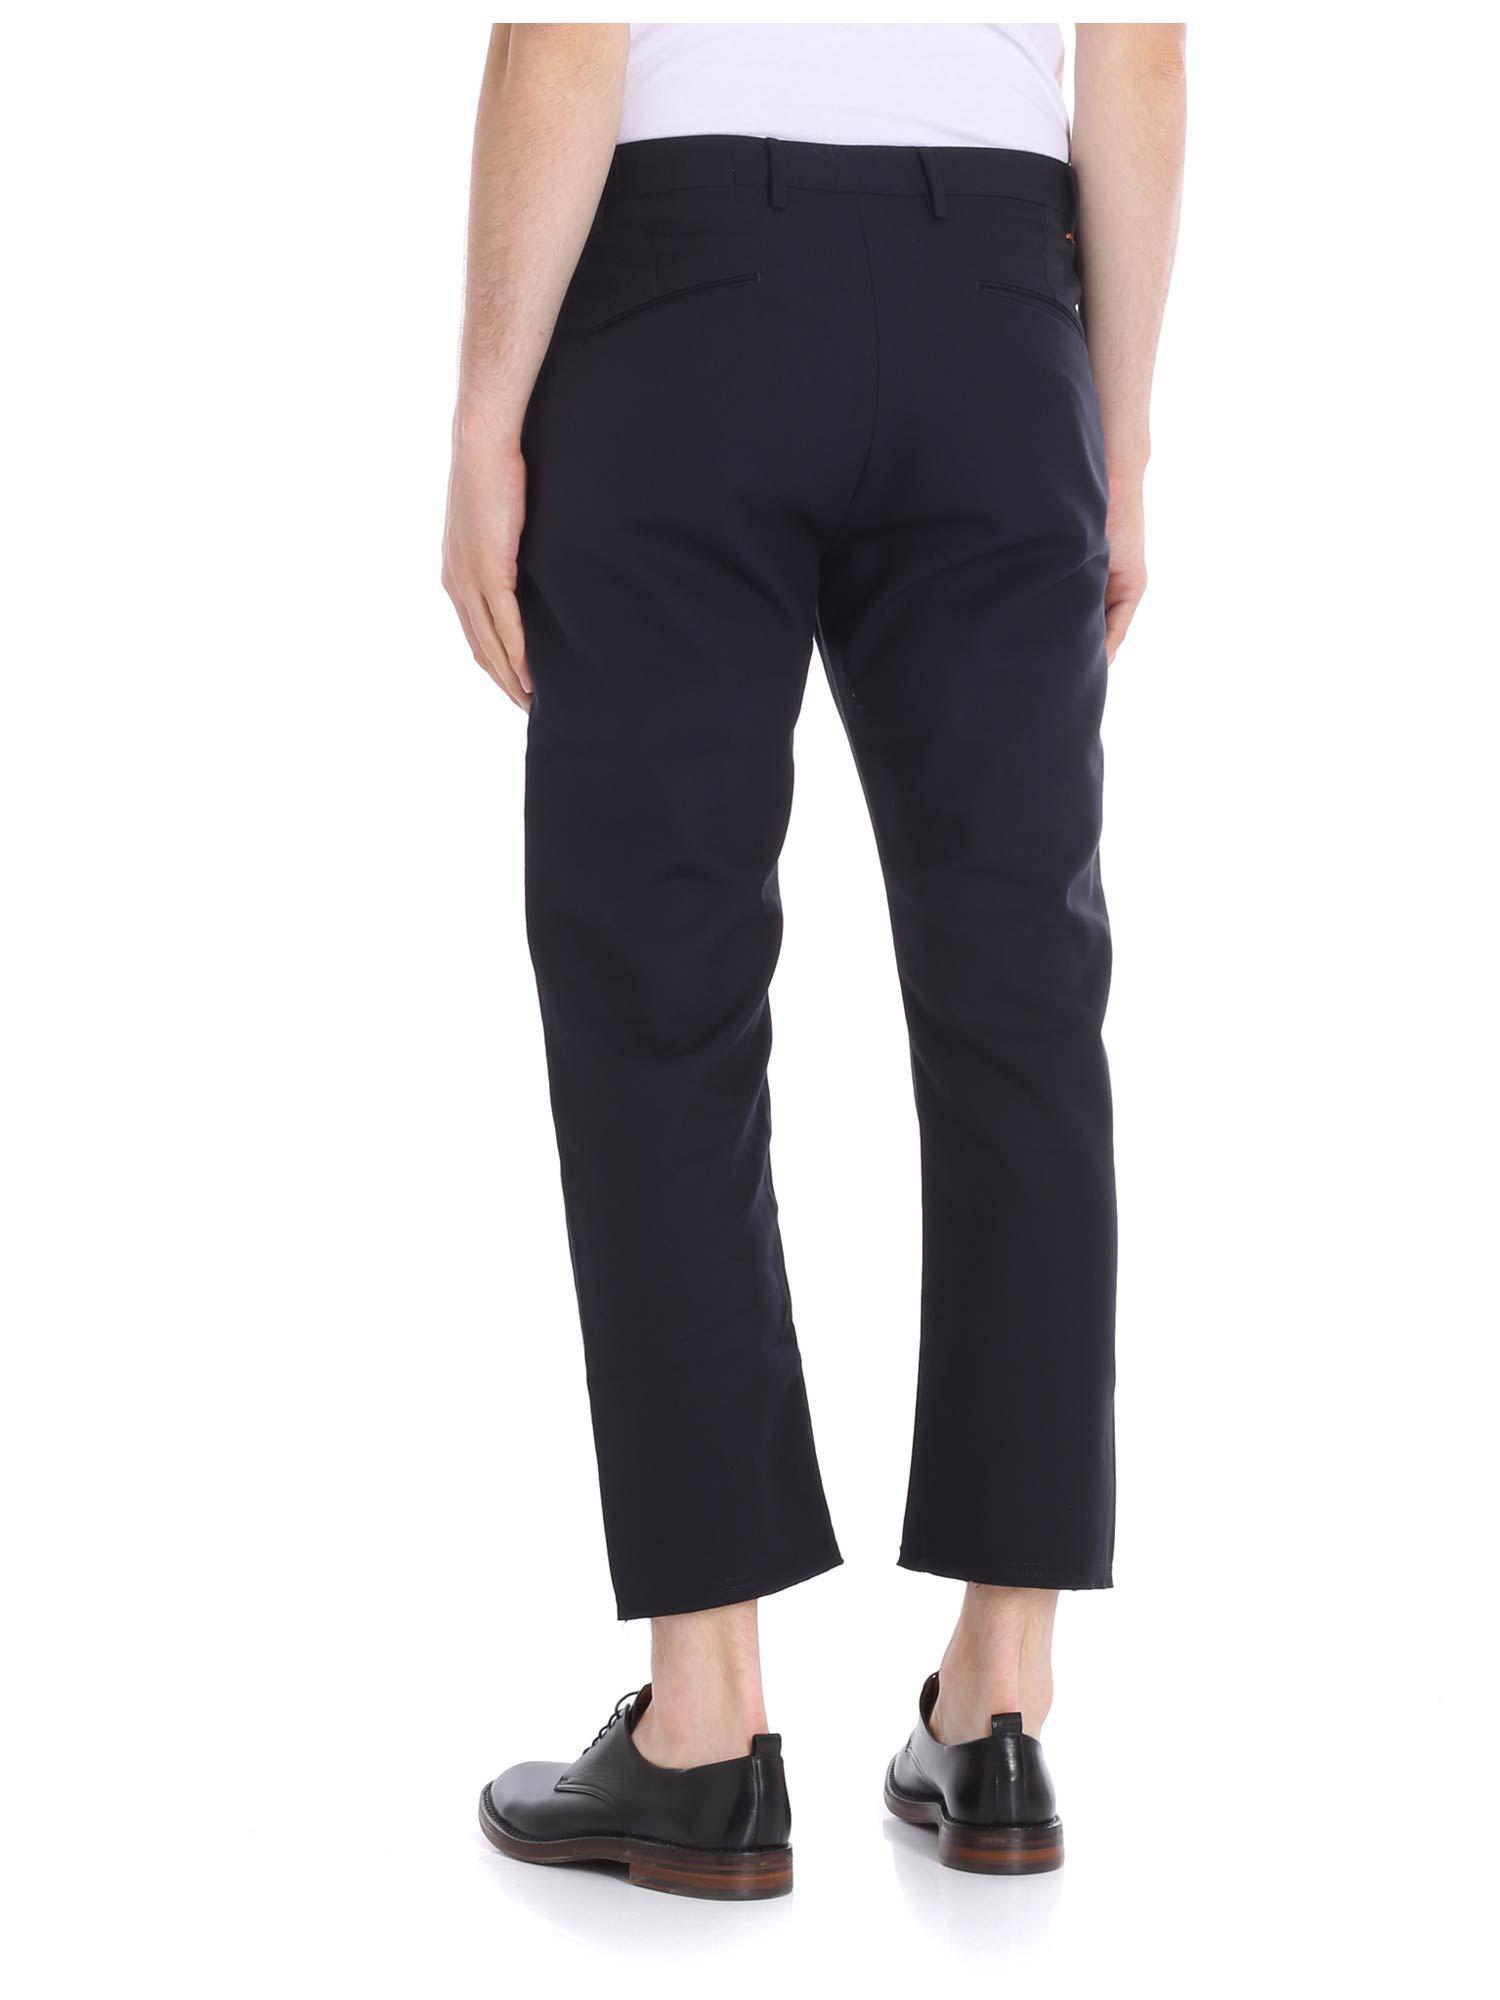 Pence Cotton Blue Baldo Trousers for Men